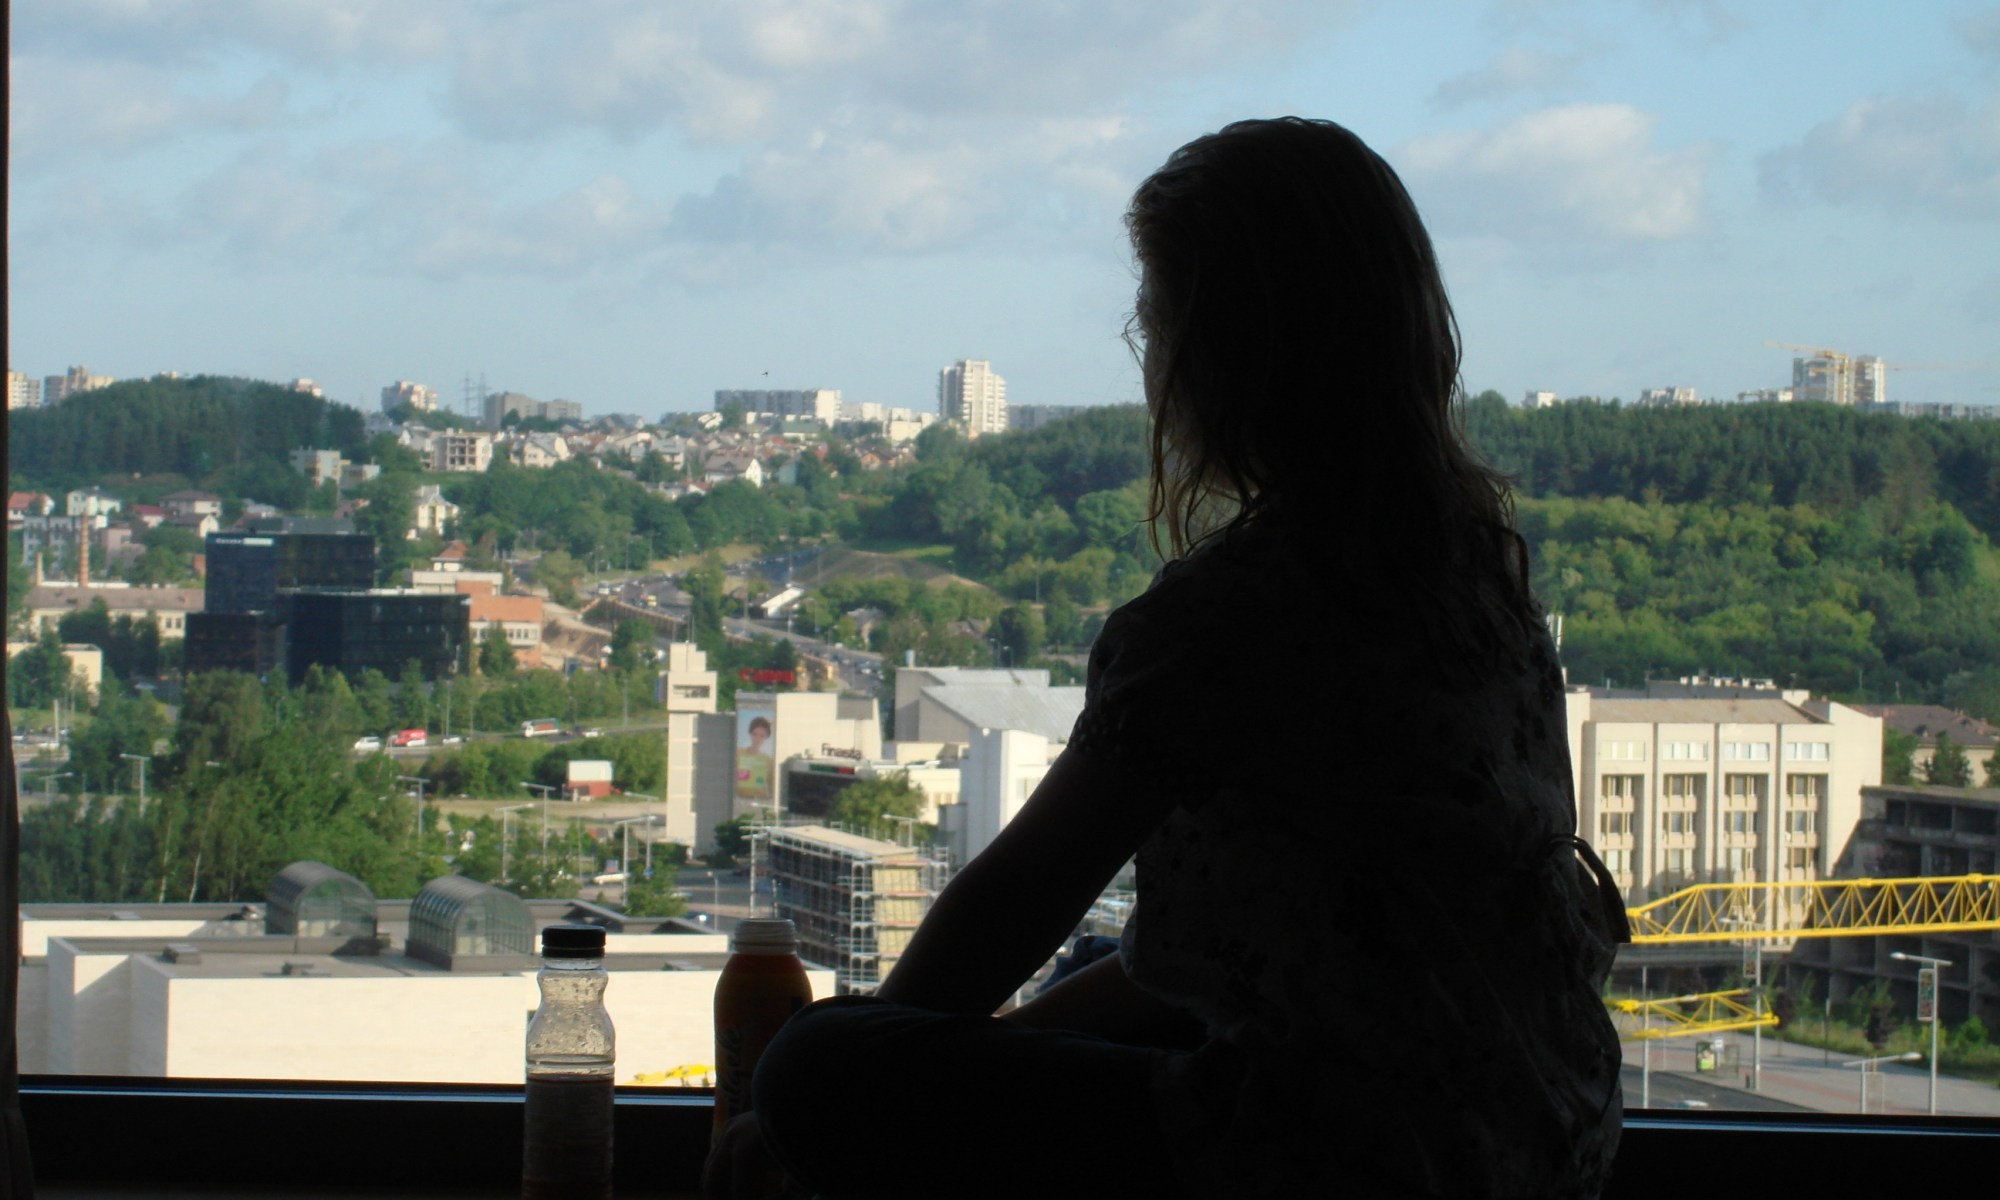 Silhouette overlooking Vilnius